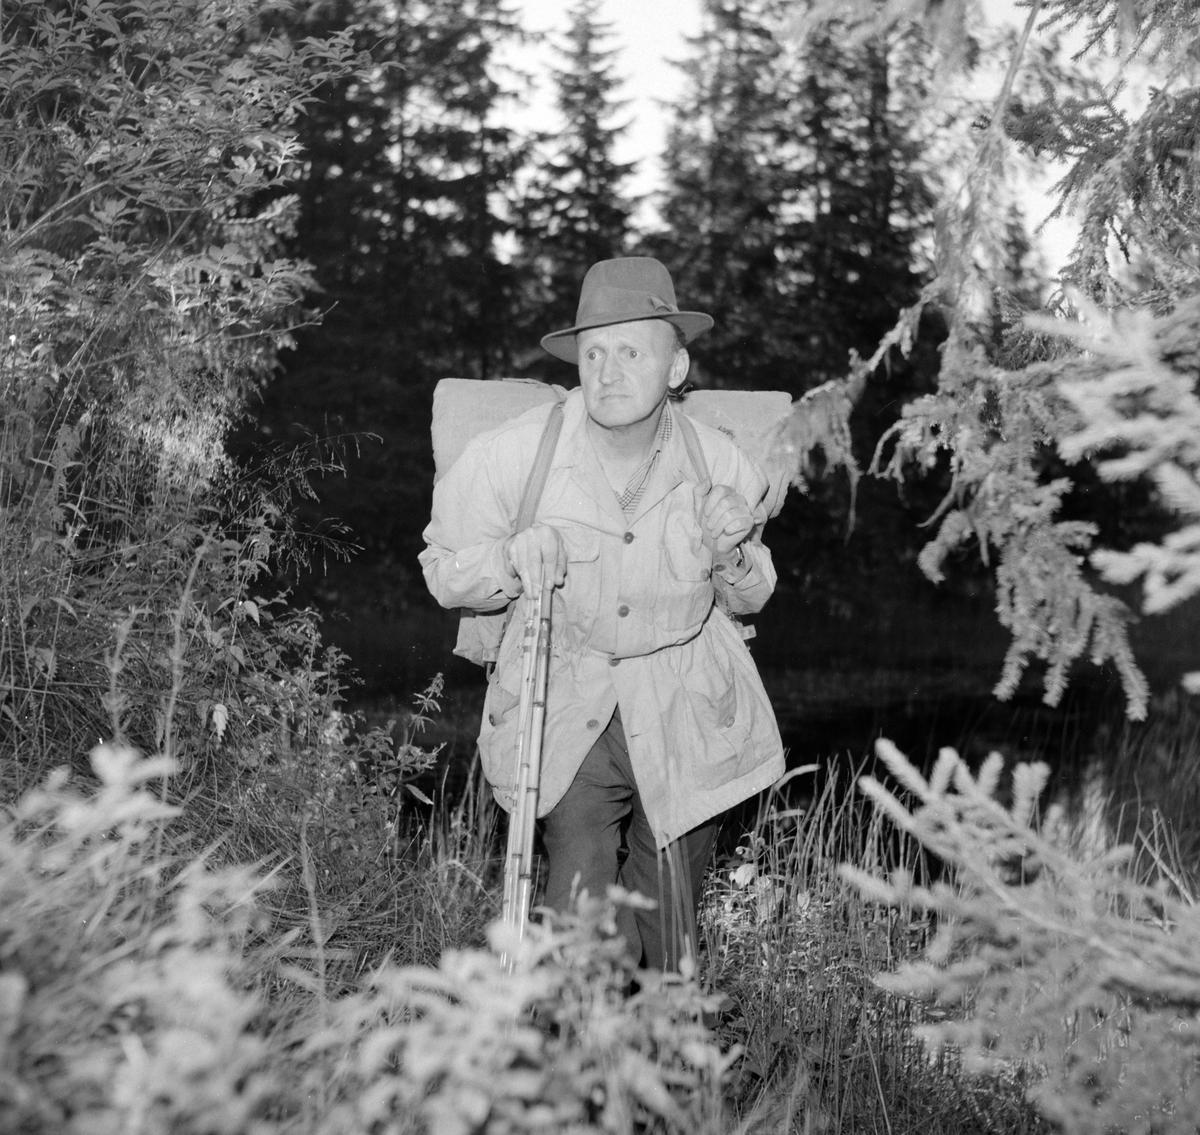 Guttorm P. Haugen. Portrett, med sekk og fiskestang. Friluftsliv.  kunstner; visedikter, forfatter og maler.